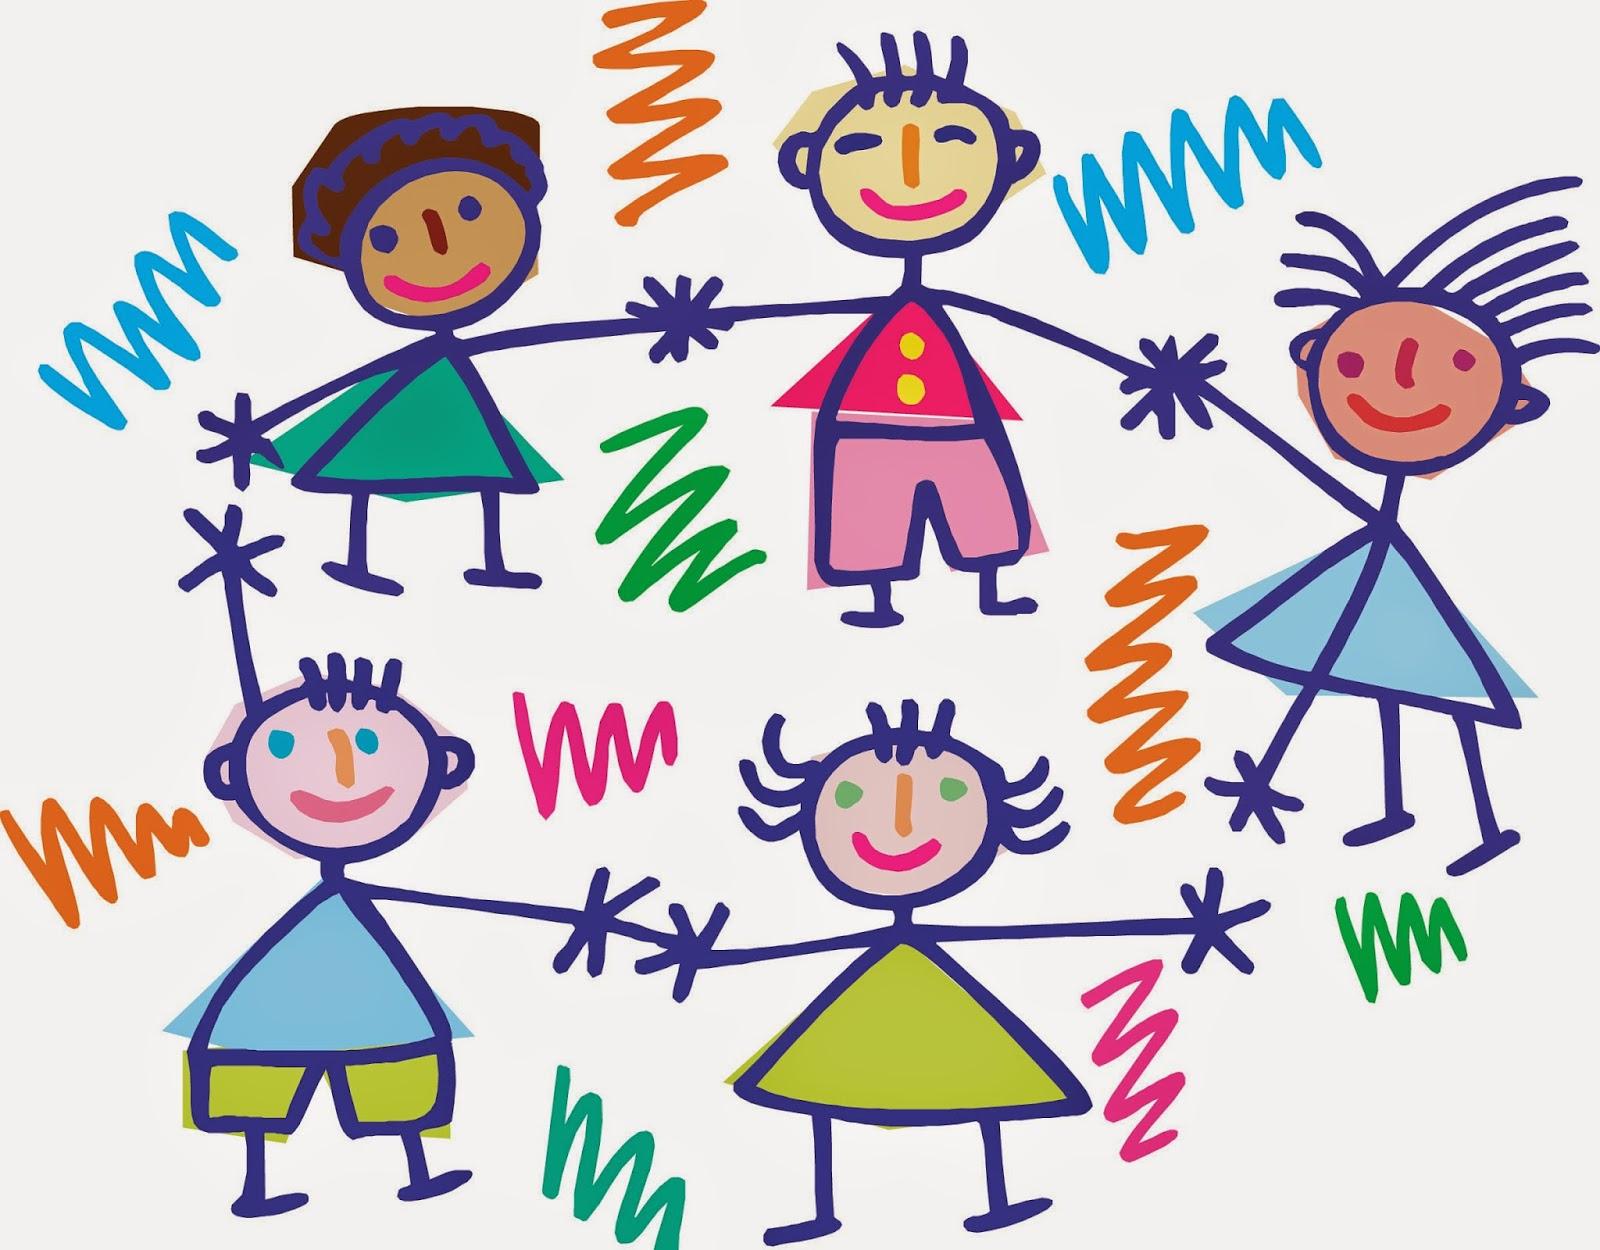 Gambar Kartun Lucu Keluarga Terbaru Top Gambar